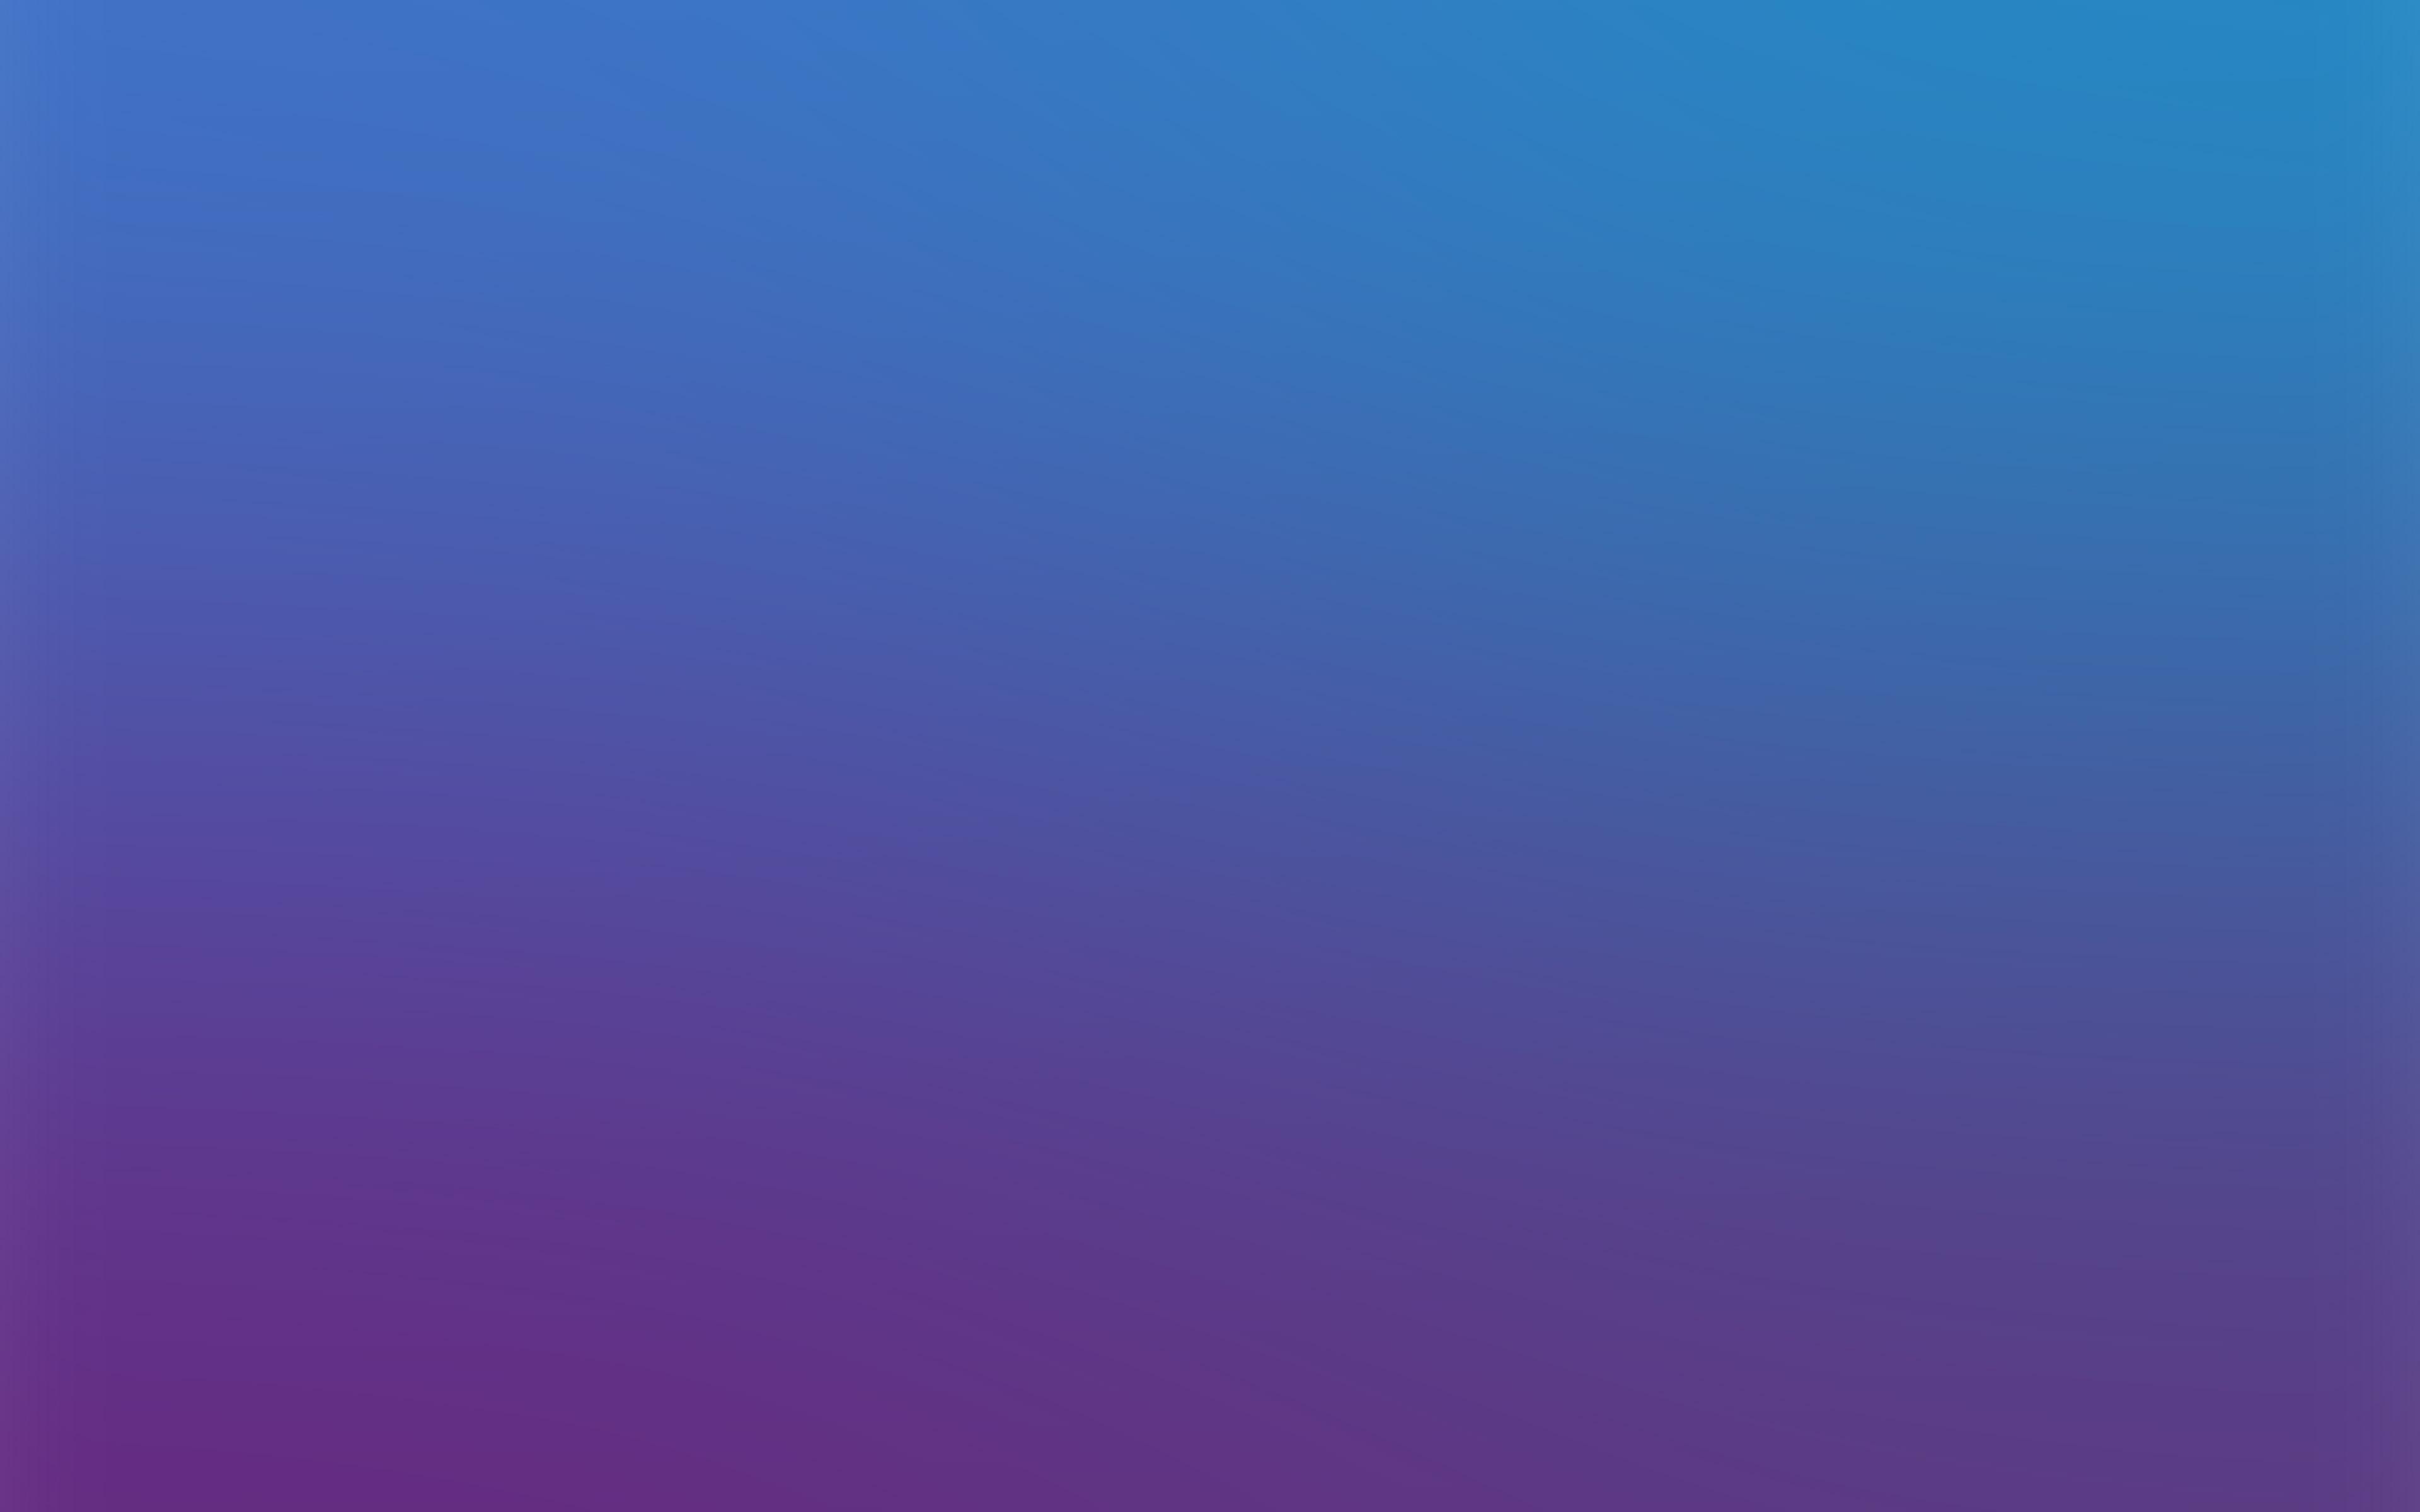 Wallpaper Simple Cute Sj99 Blue Purple Gradation Blur Wallpaper